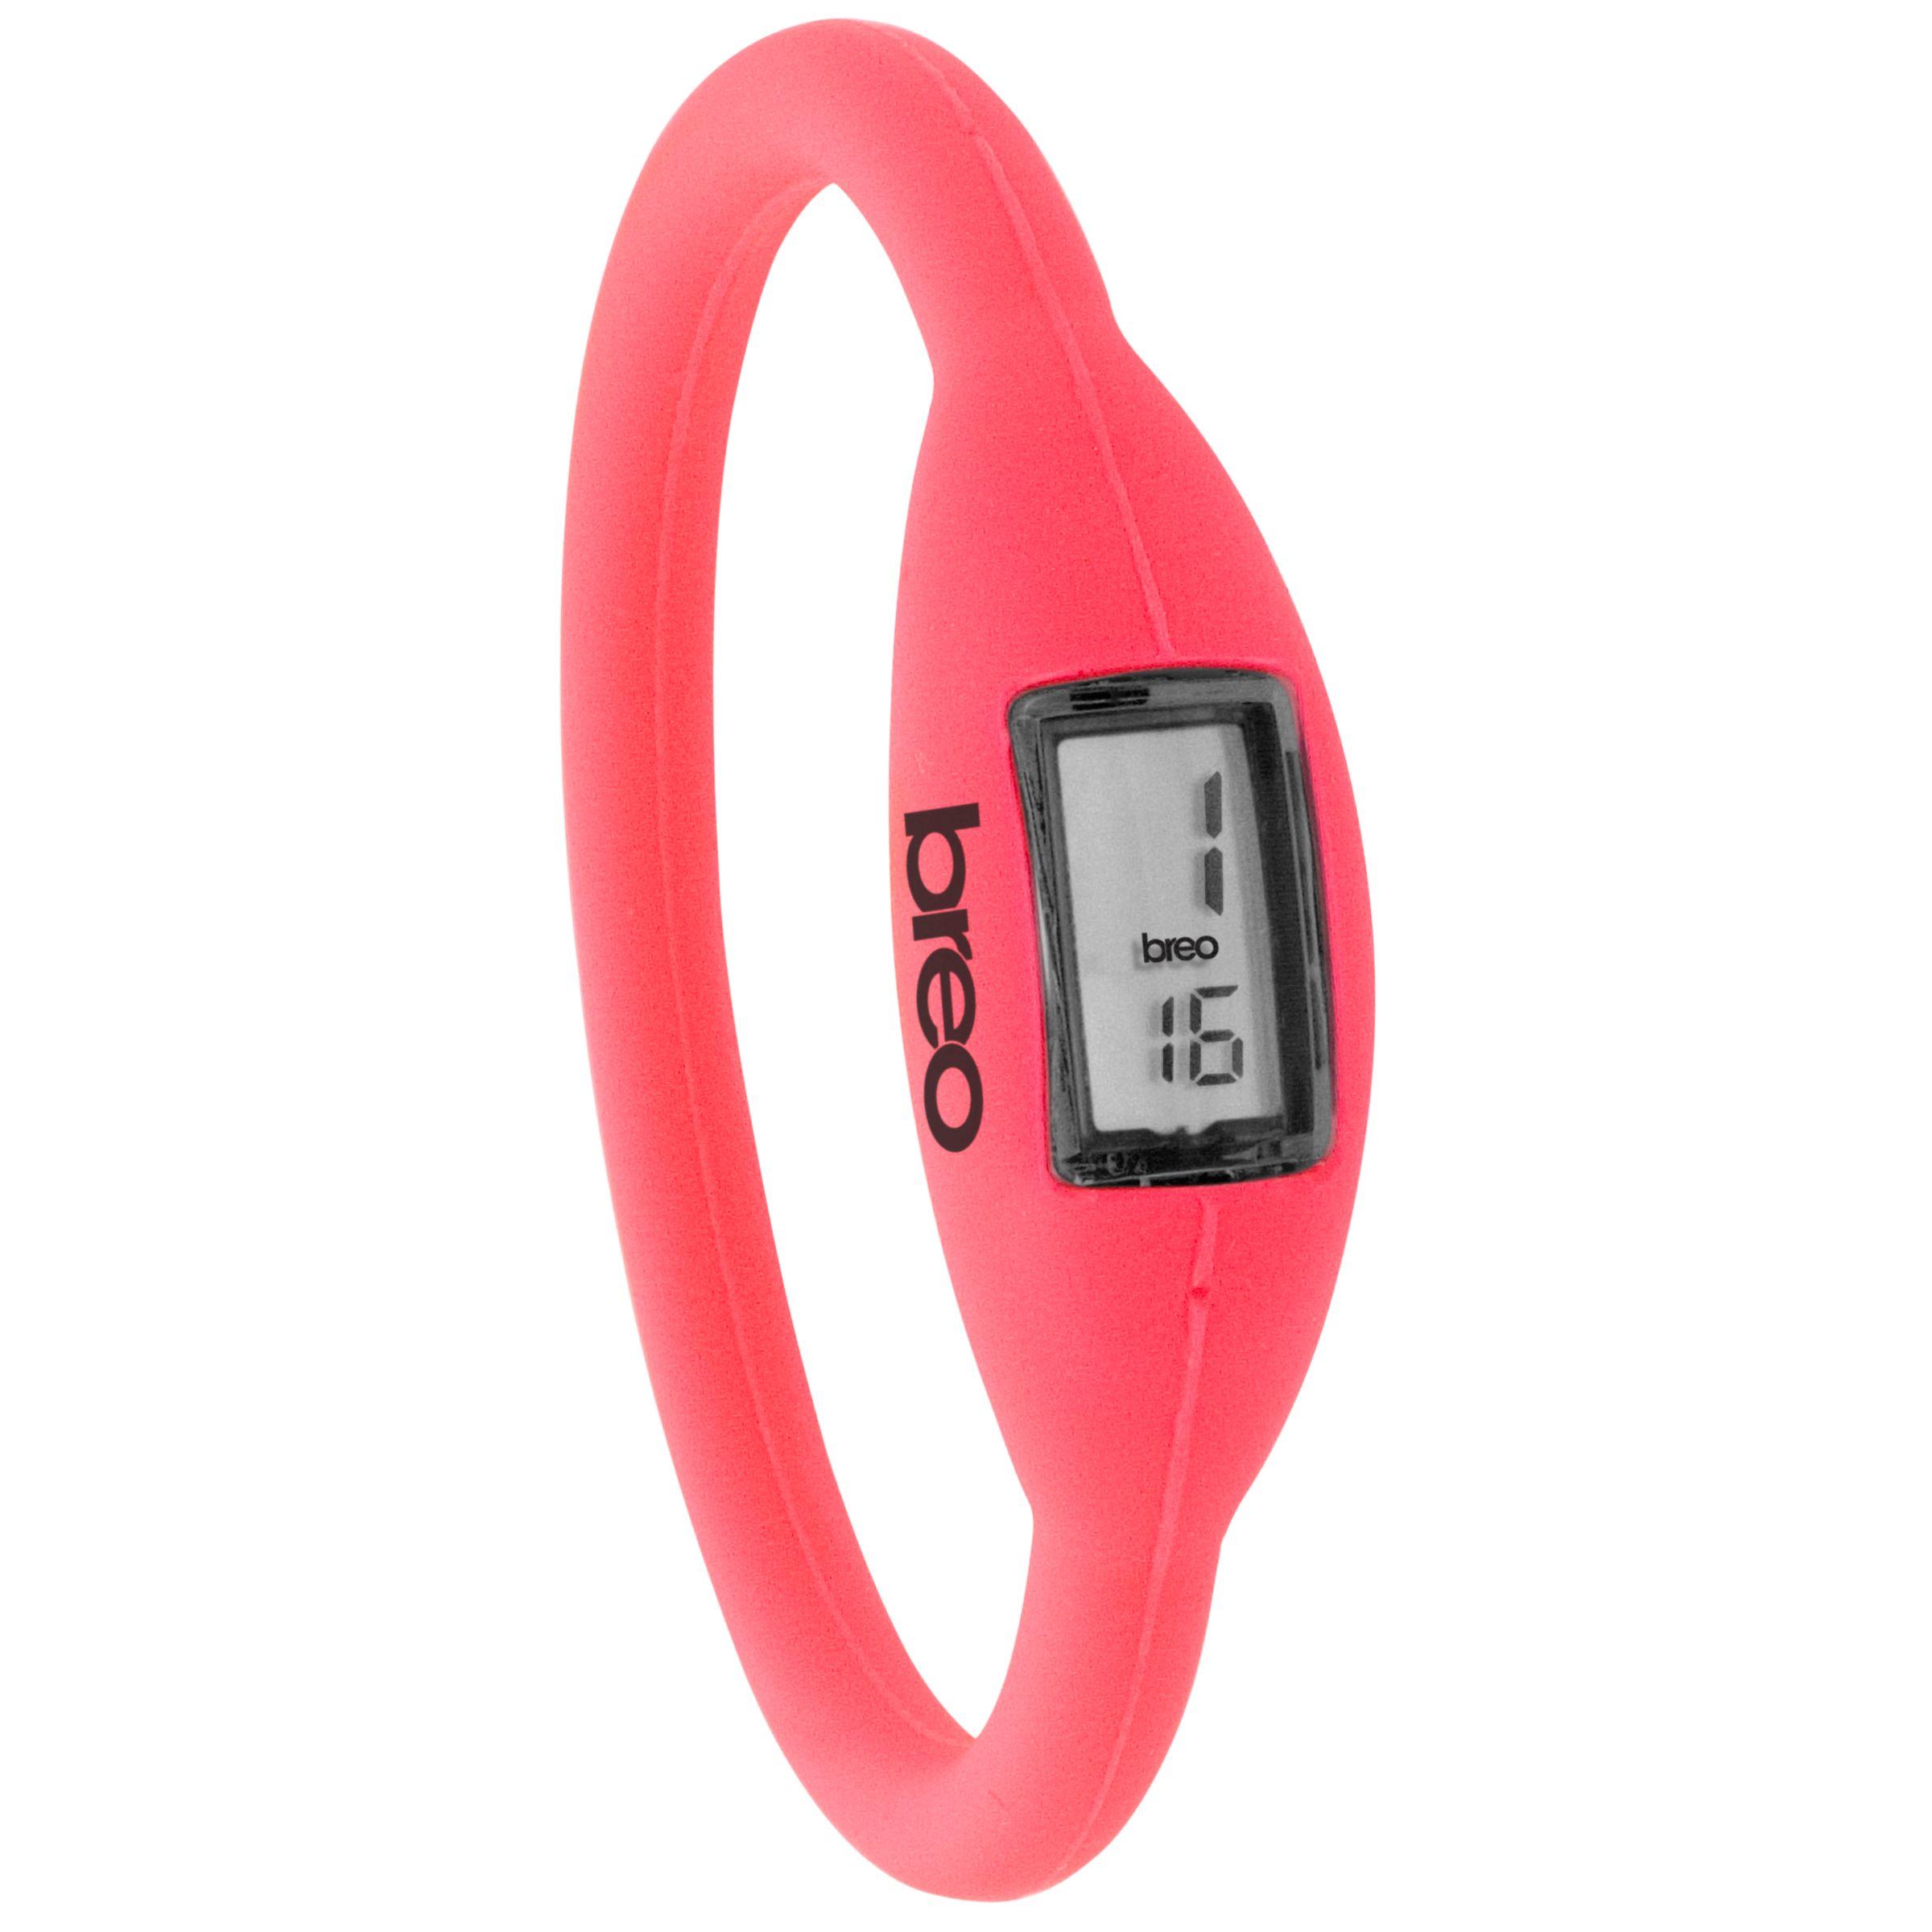 Breo Roam B-TI-NR3 Digital Watch, Fluro Pink